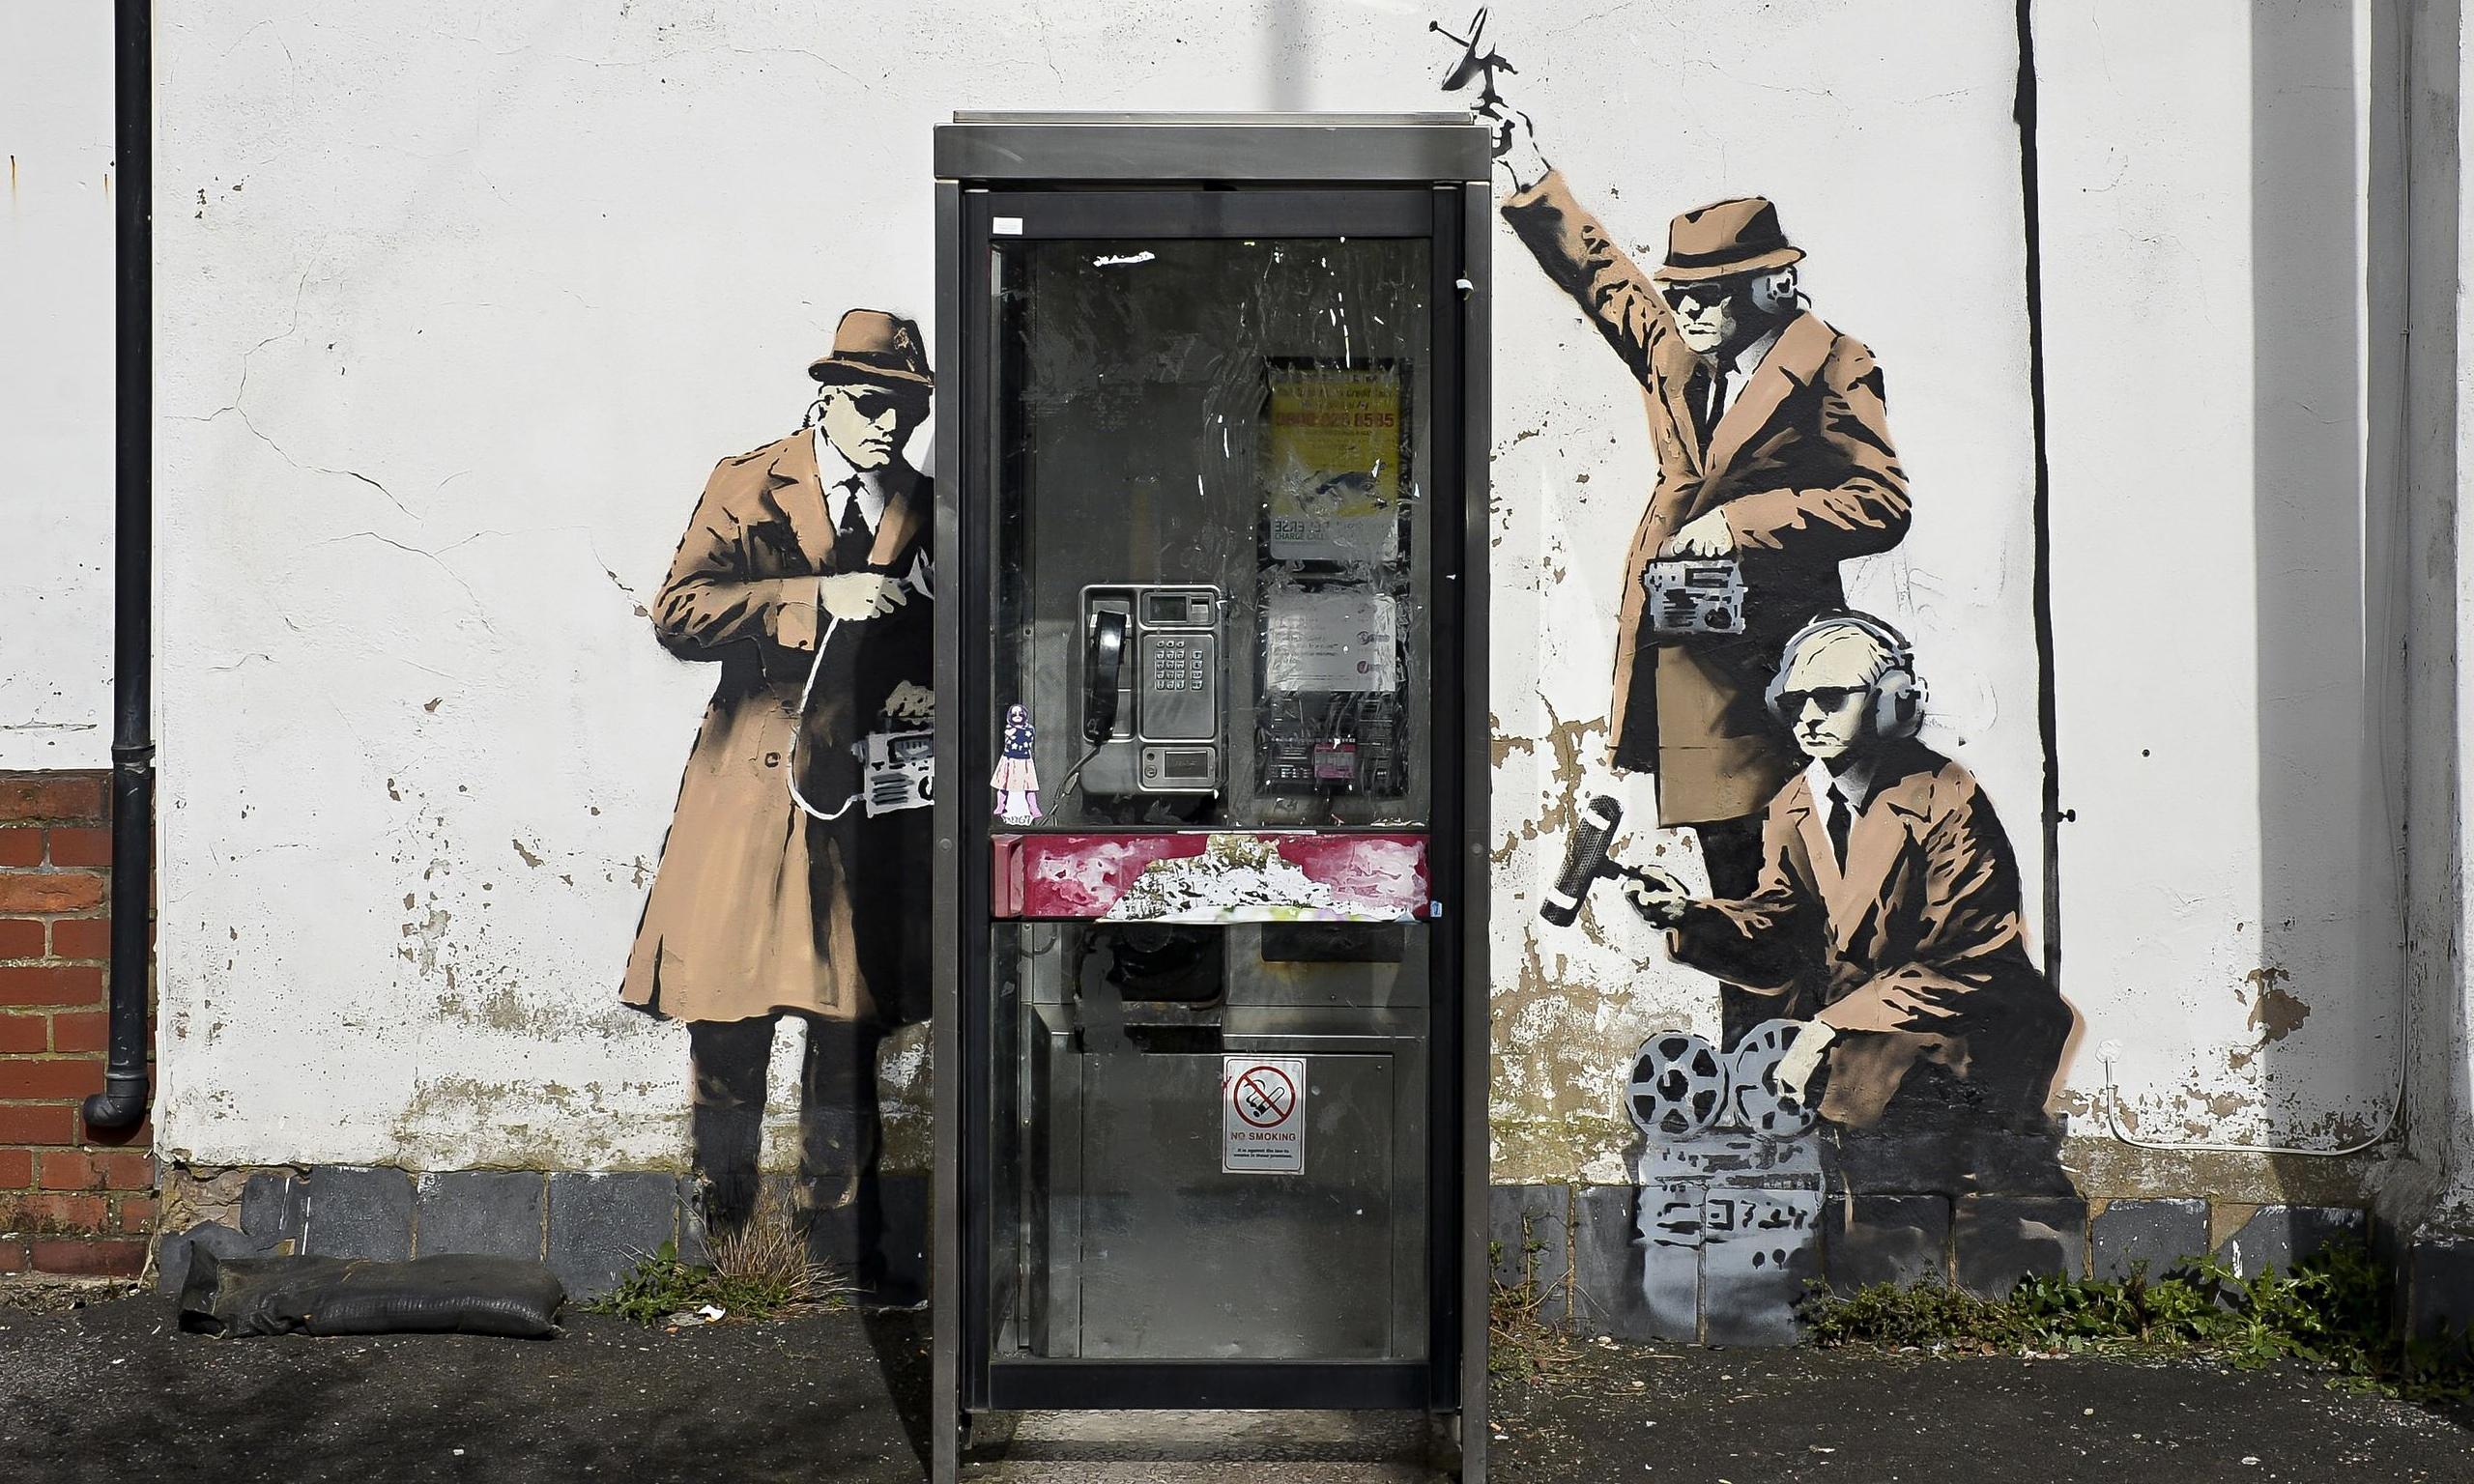 banksy spies mural  maintenance work on property halted